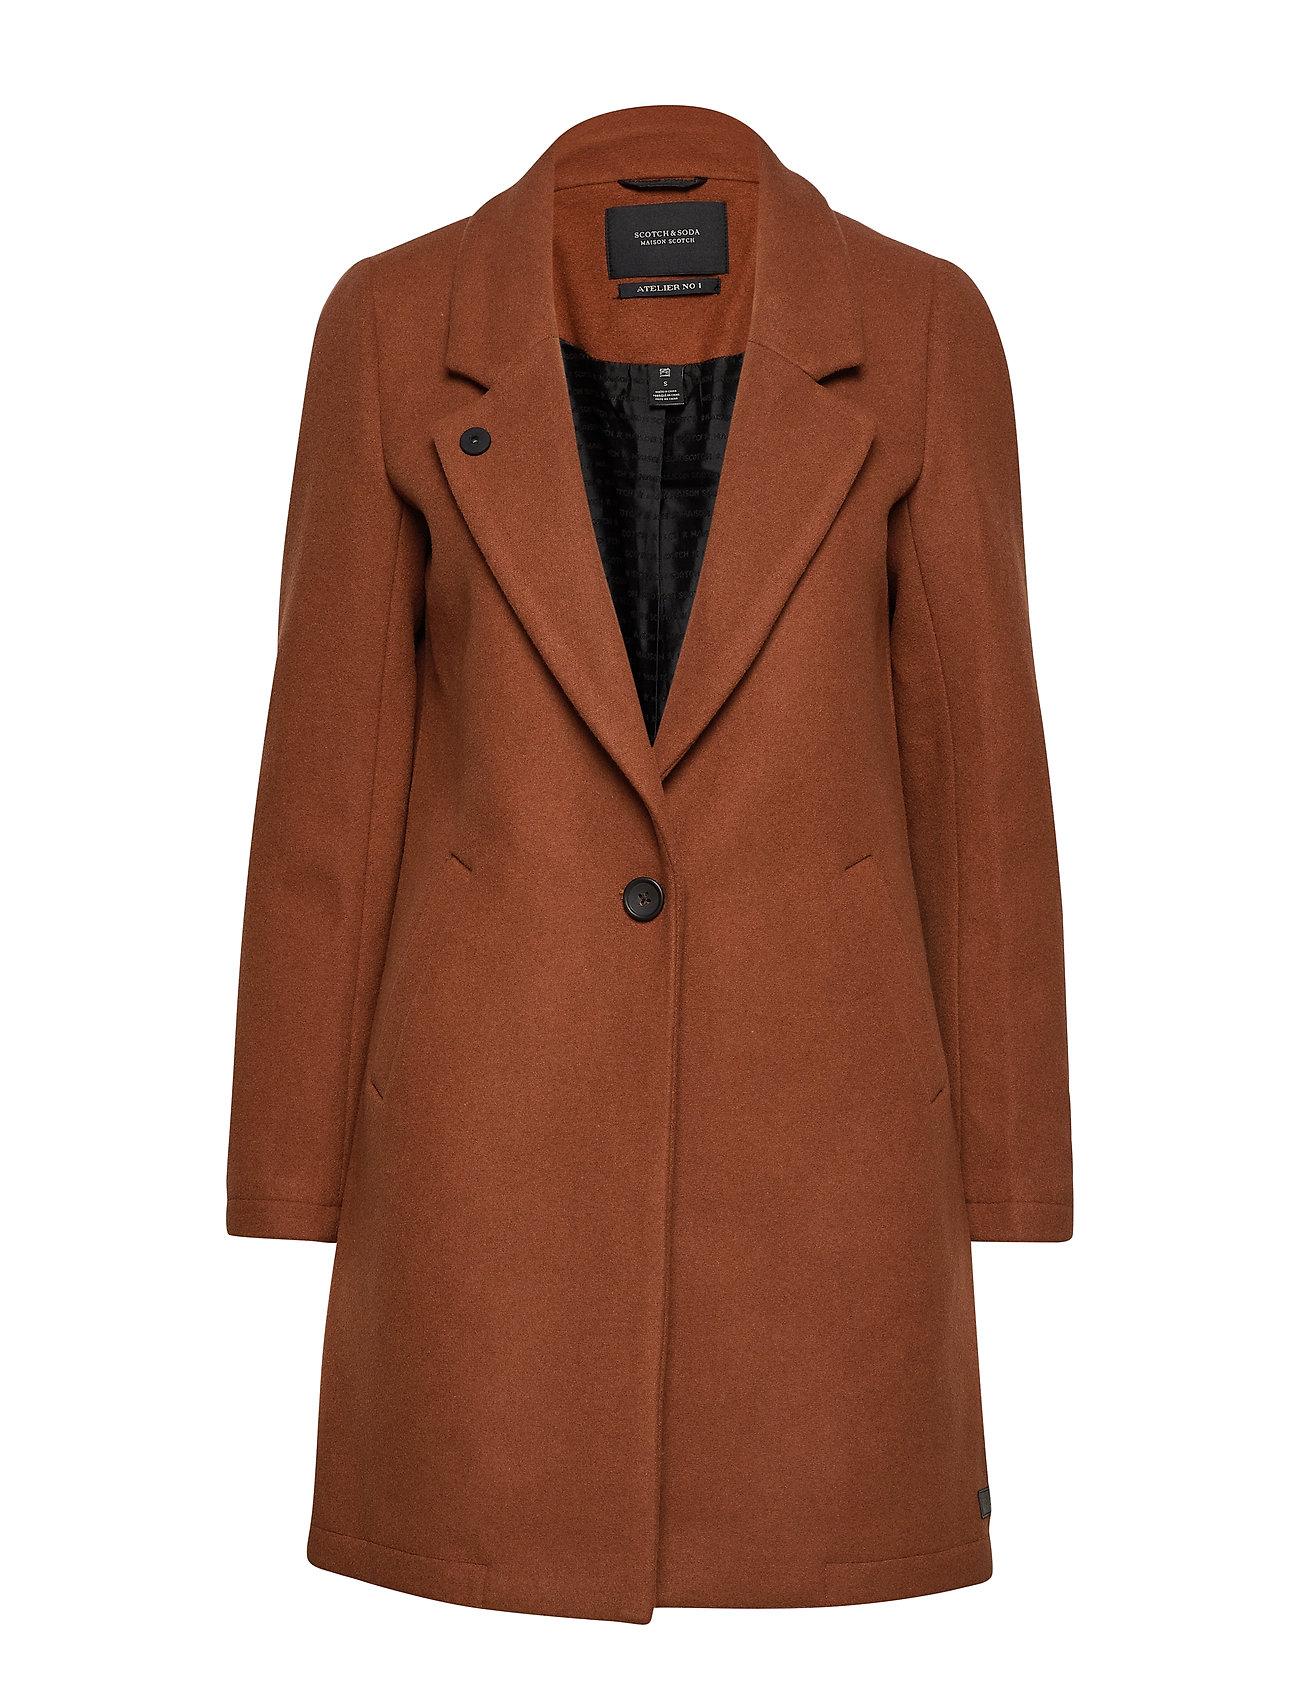 Scotch & Soda Classic tailored coat with half lining - CEDAR WOOD